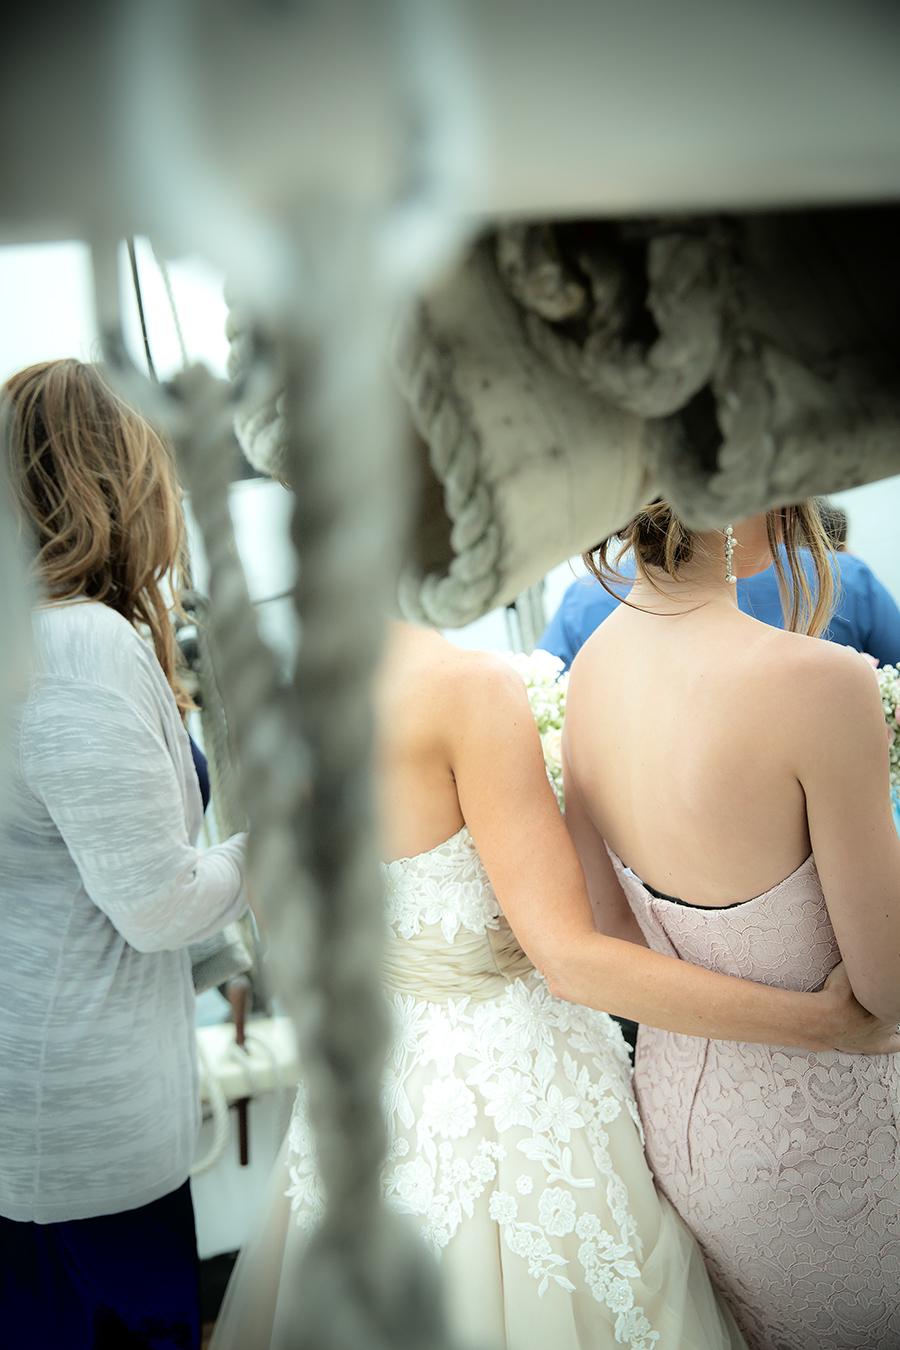 hug daughter mast abscured(WEB).jpg